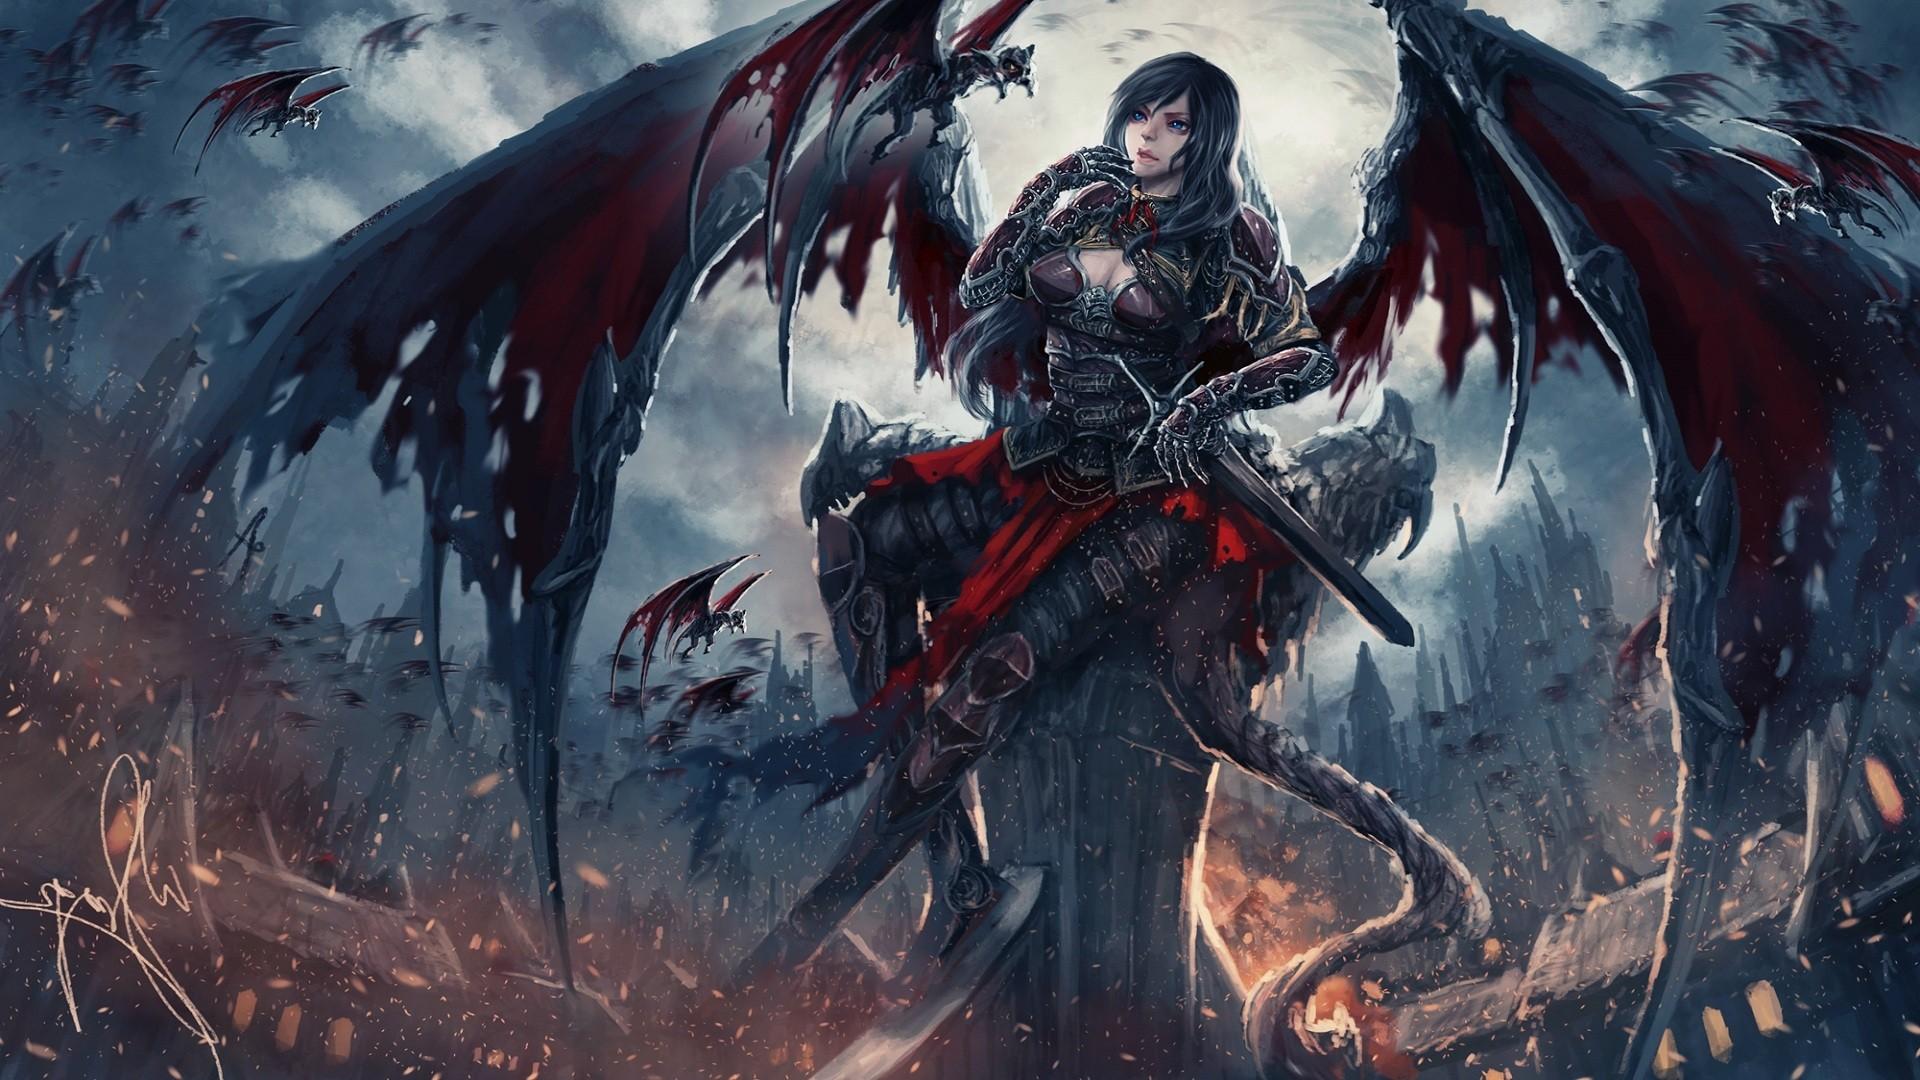 artwork, Wings, Destruction, DeviantArt, Long hair, Armor, Castle, Creature Wallpaper